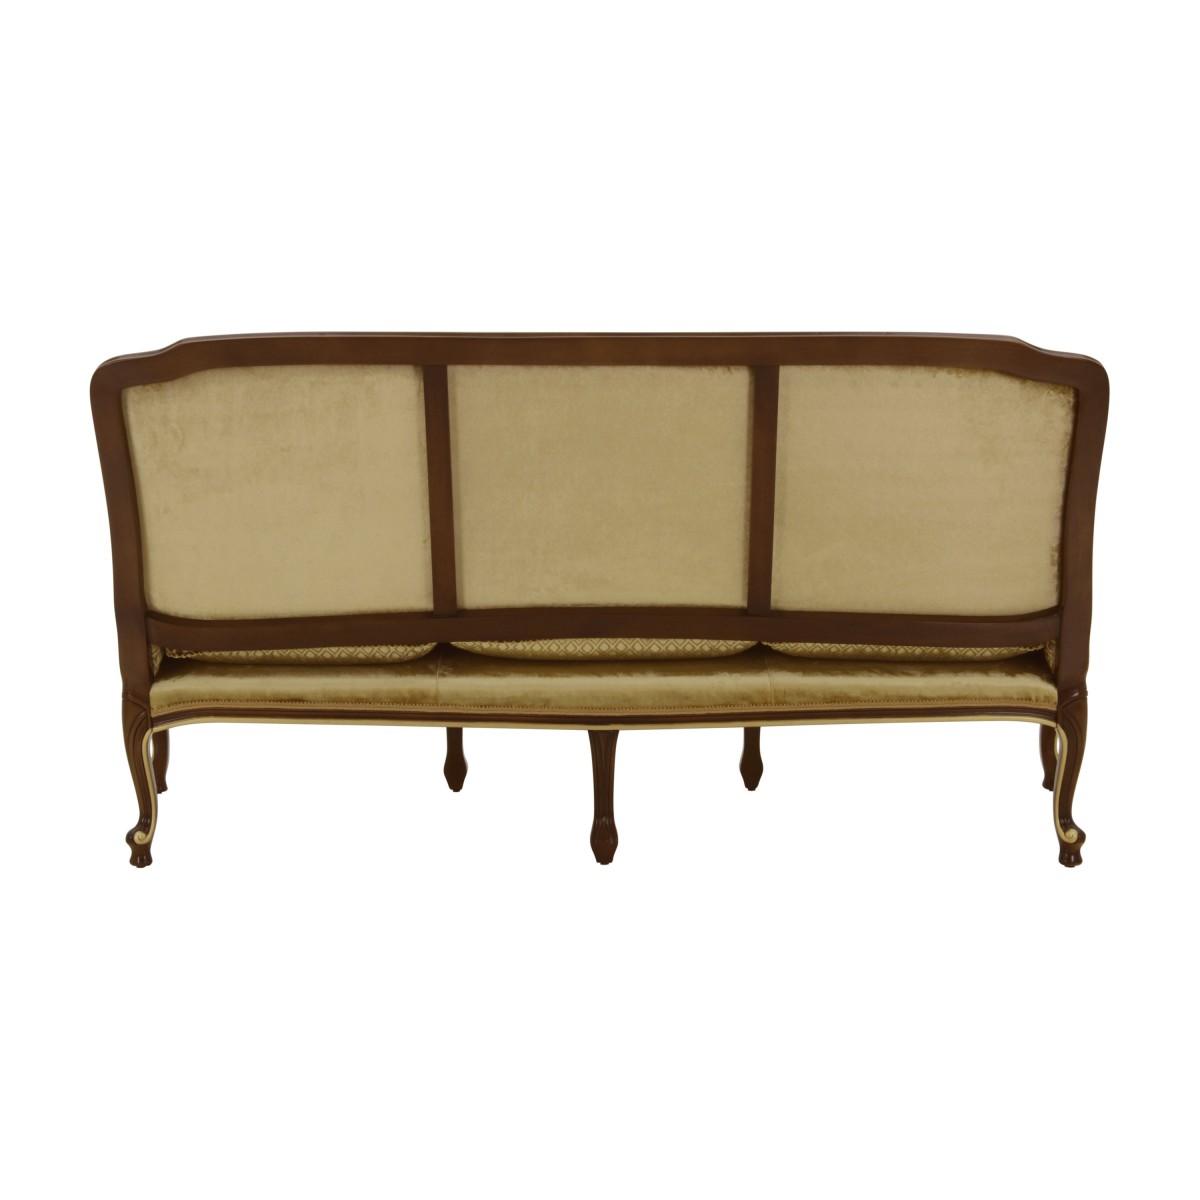 3 Seater sofa Carmen - Sevensedie